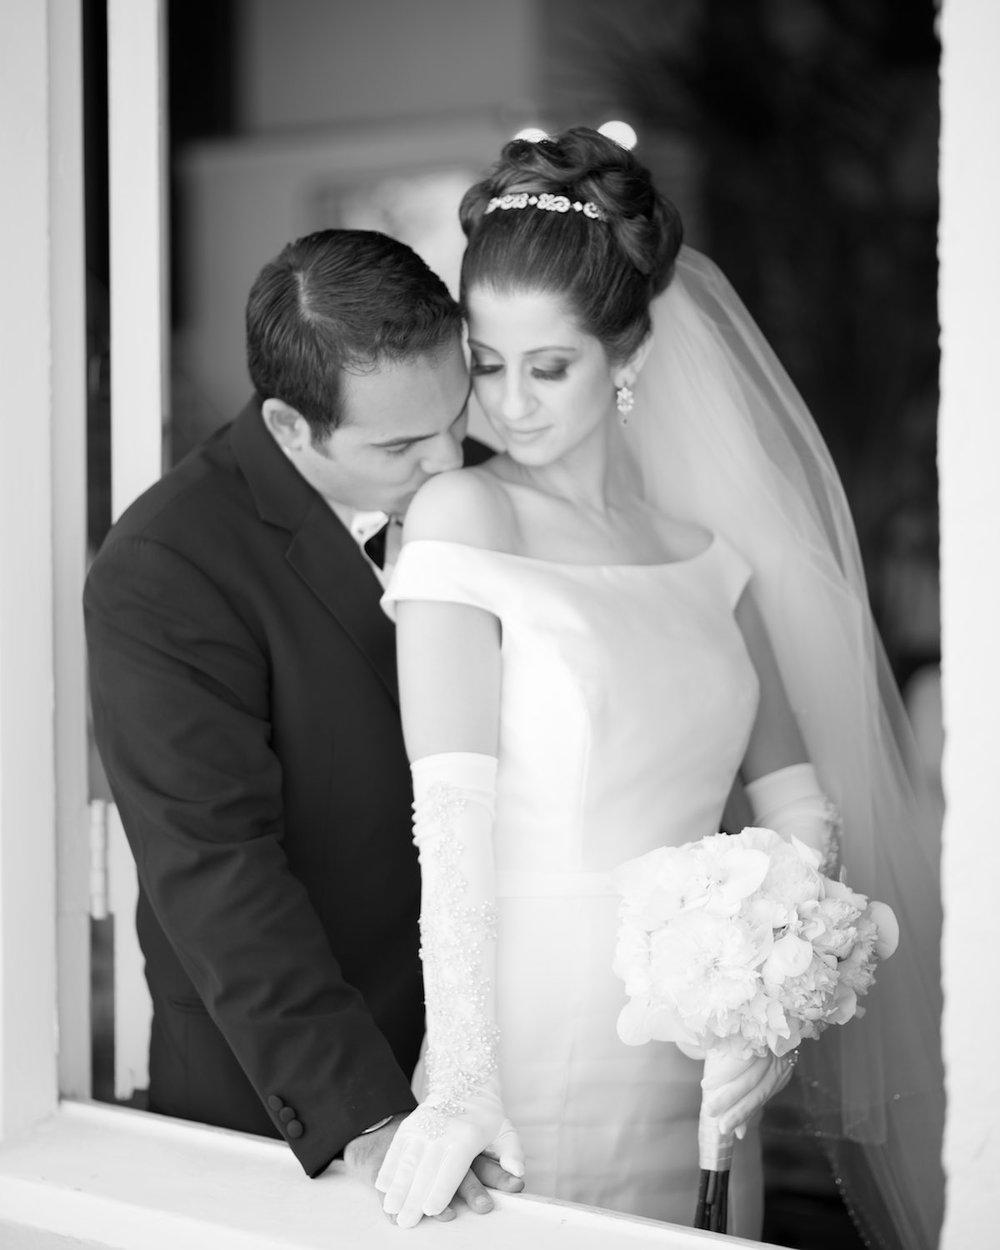 la-valencia-wedding-michal-pfeil-21.jpg